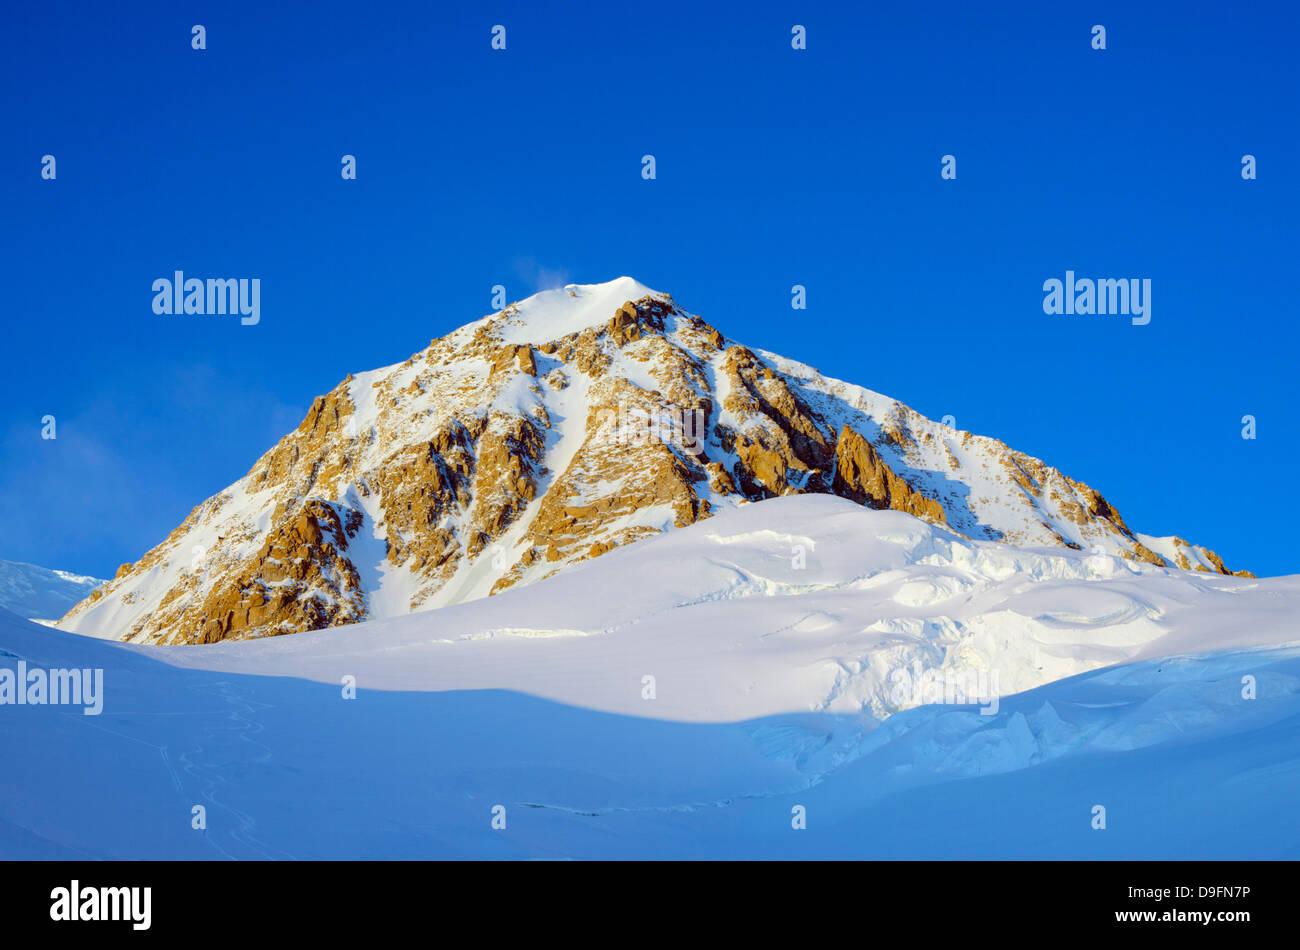 Mount McKinley, 6194m, highest mountain in North America, Denali National Park, Alaska, USA - Stock Image